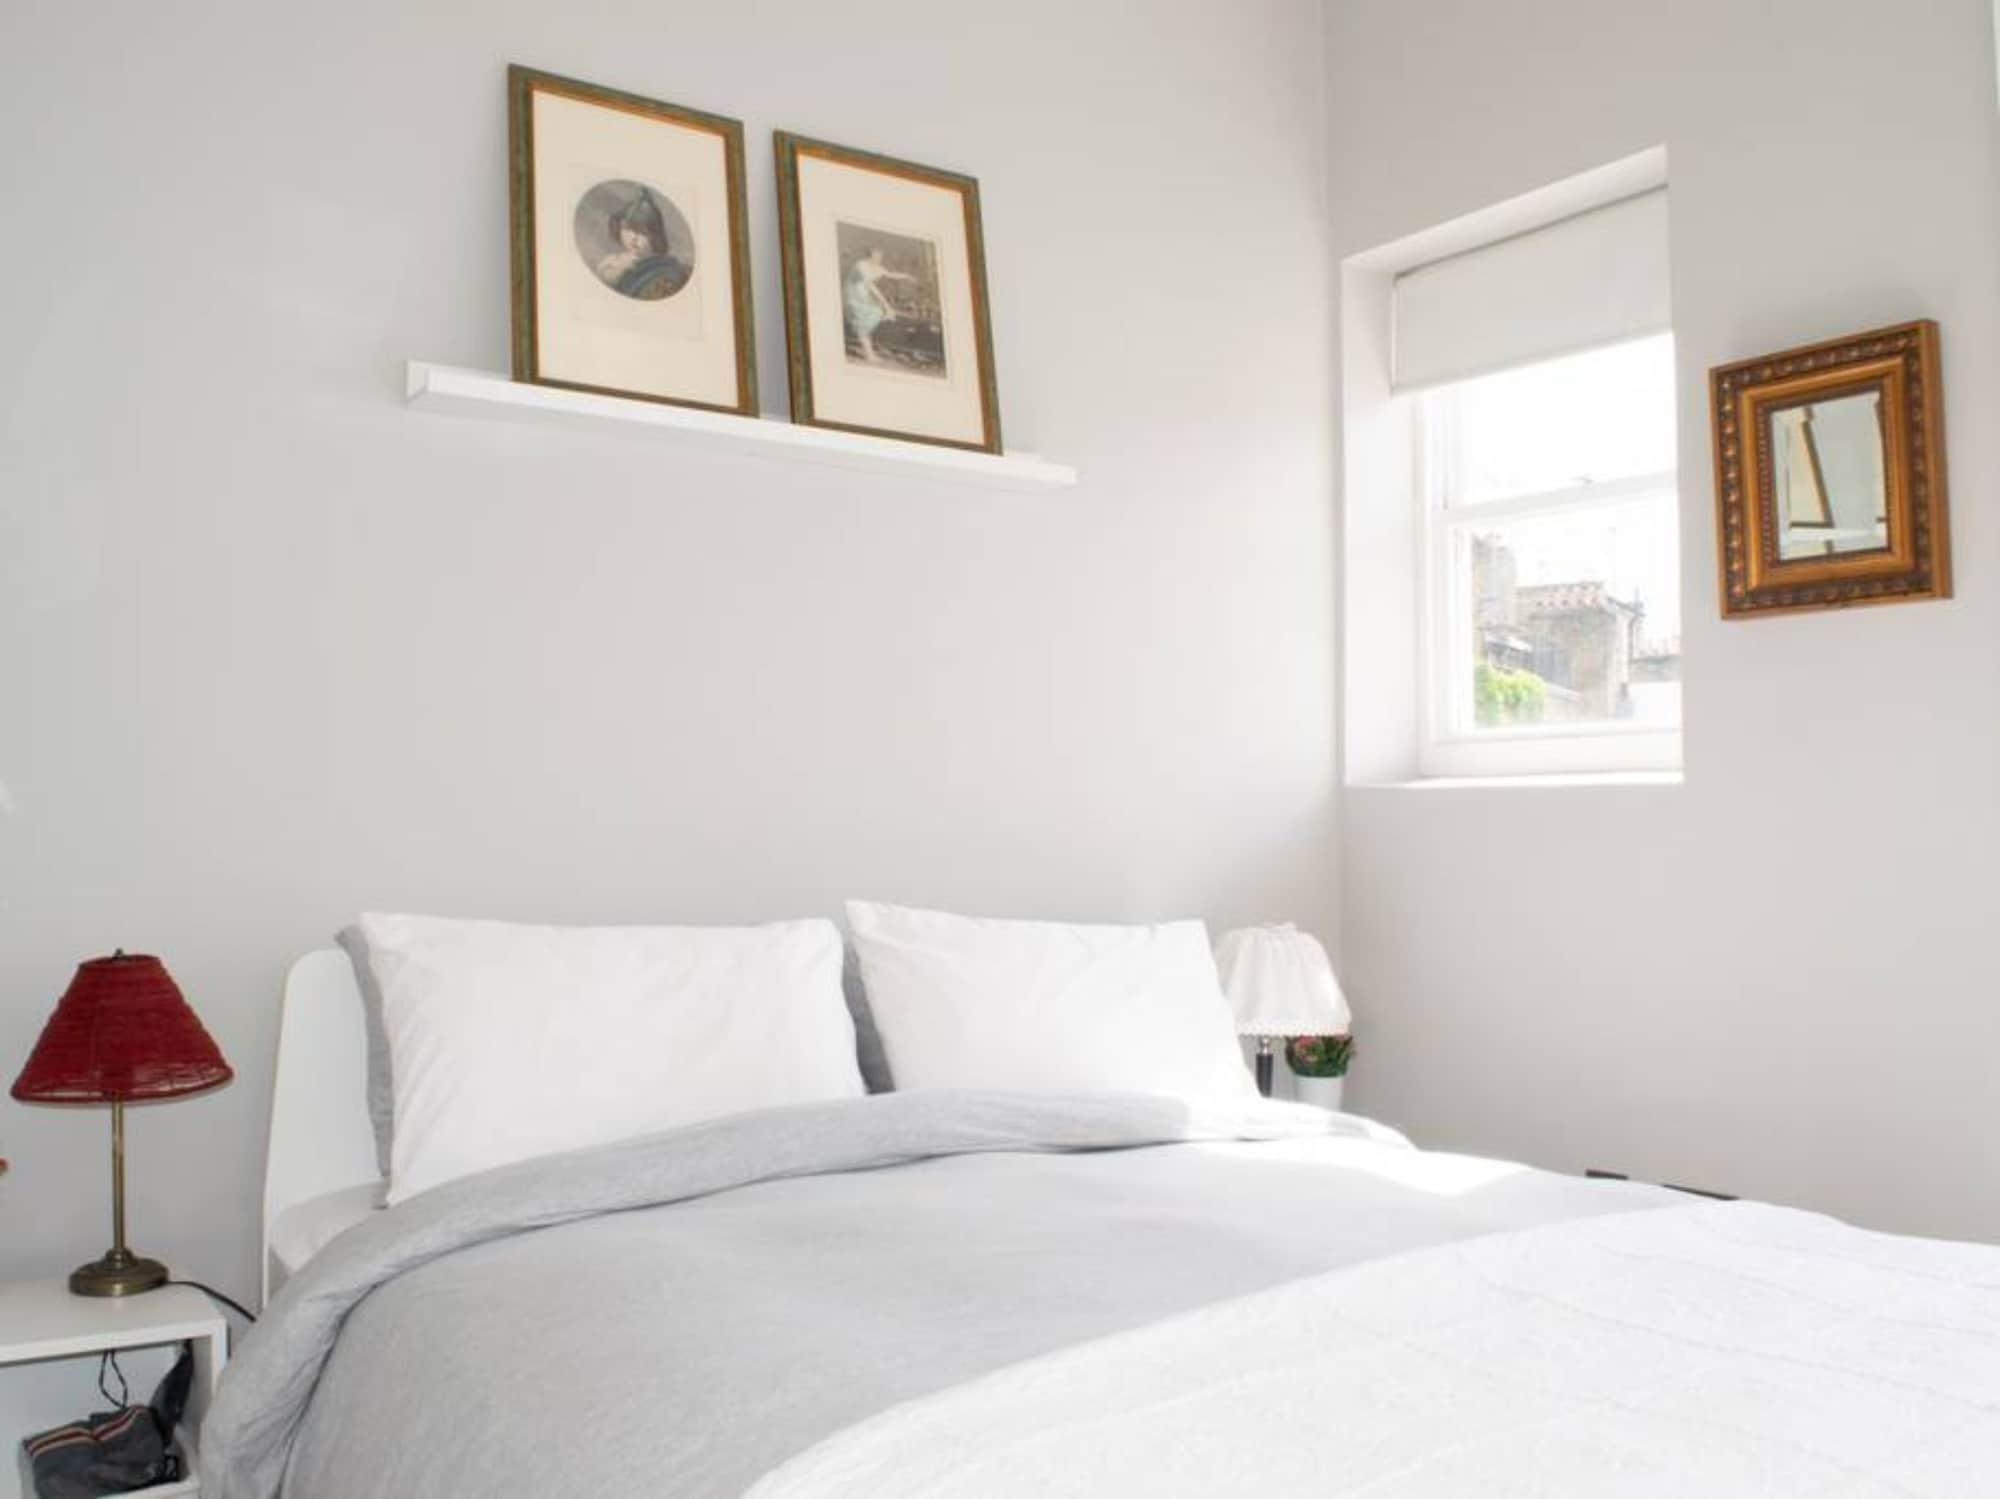 1 Bedroom Flat Next To Little Venice, London